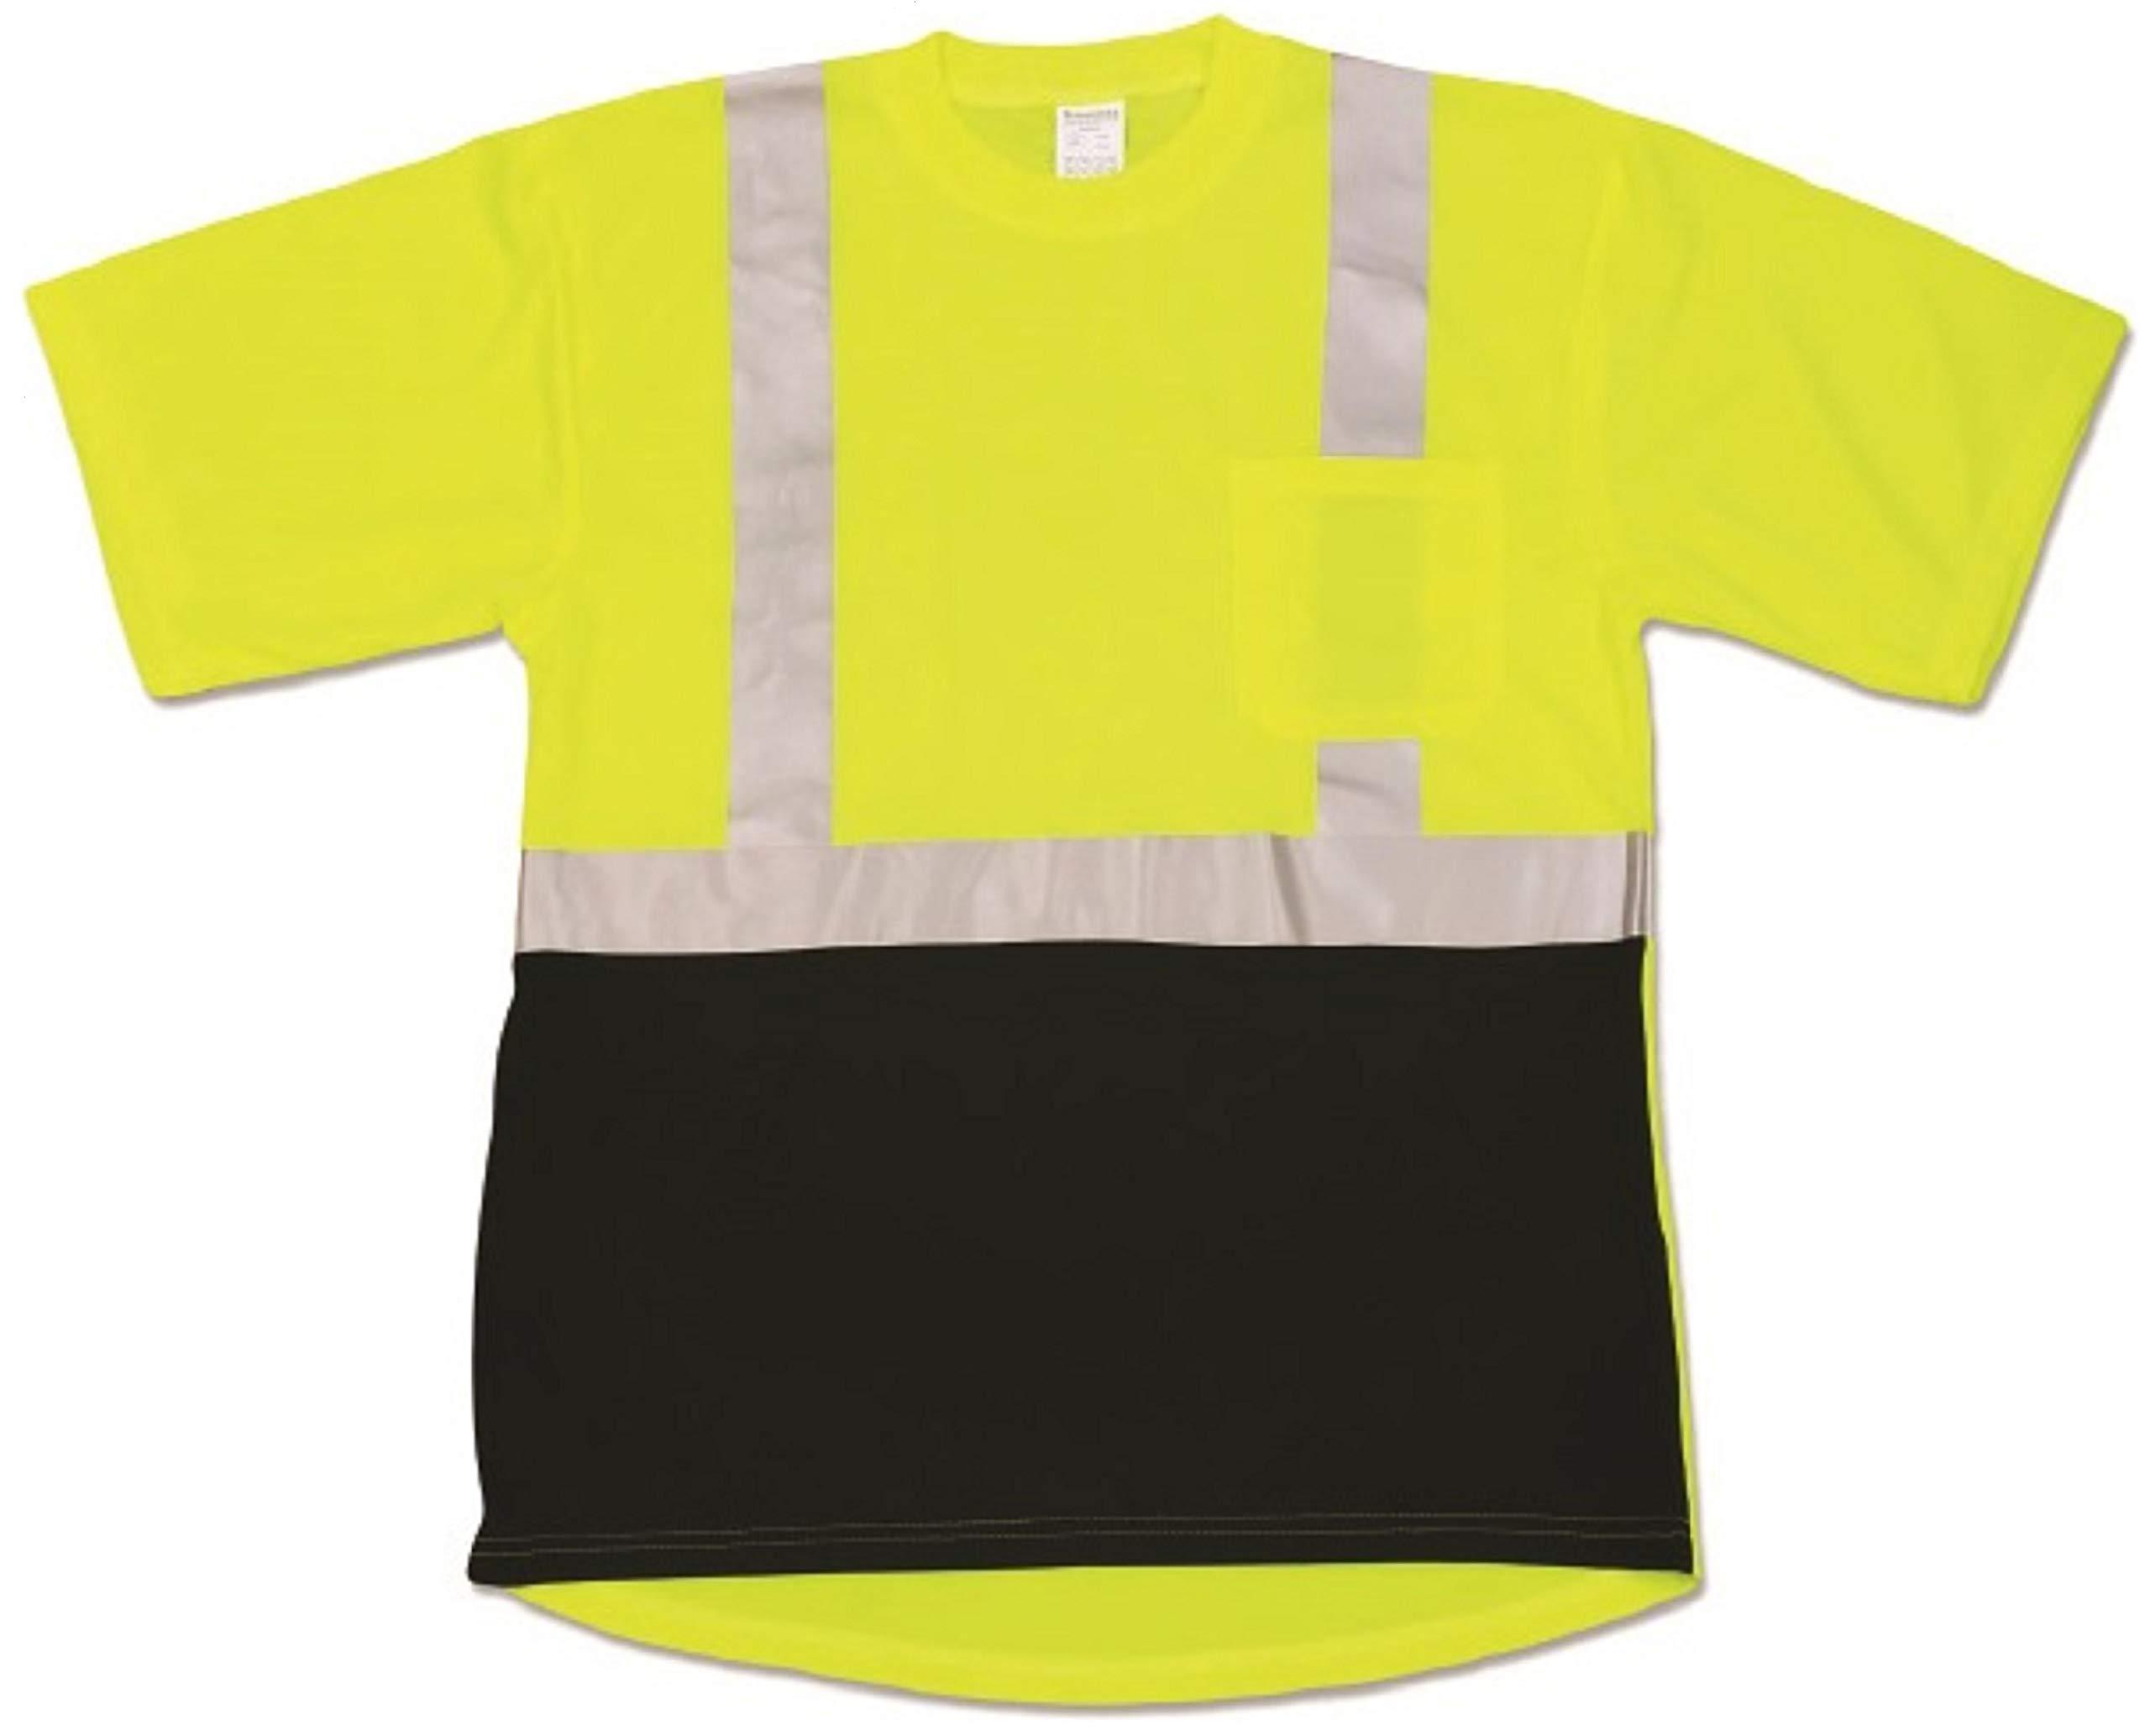 Wickmaster Shirt 2001B (10, Small)